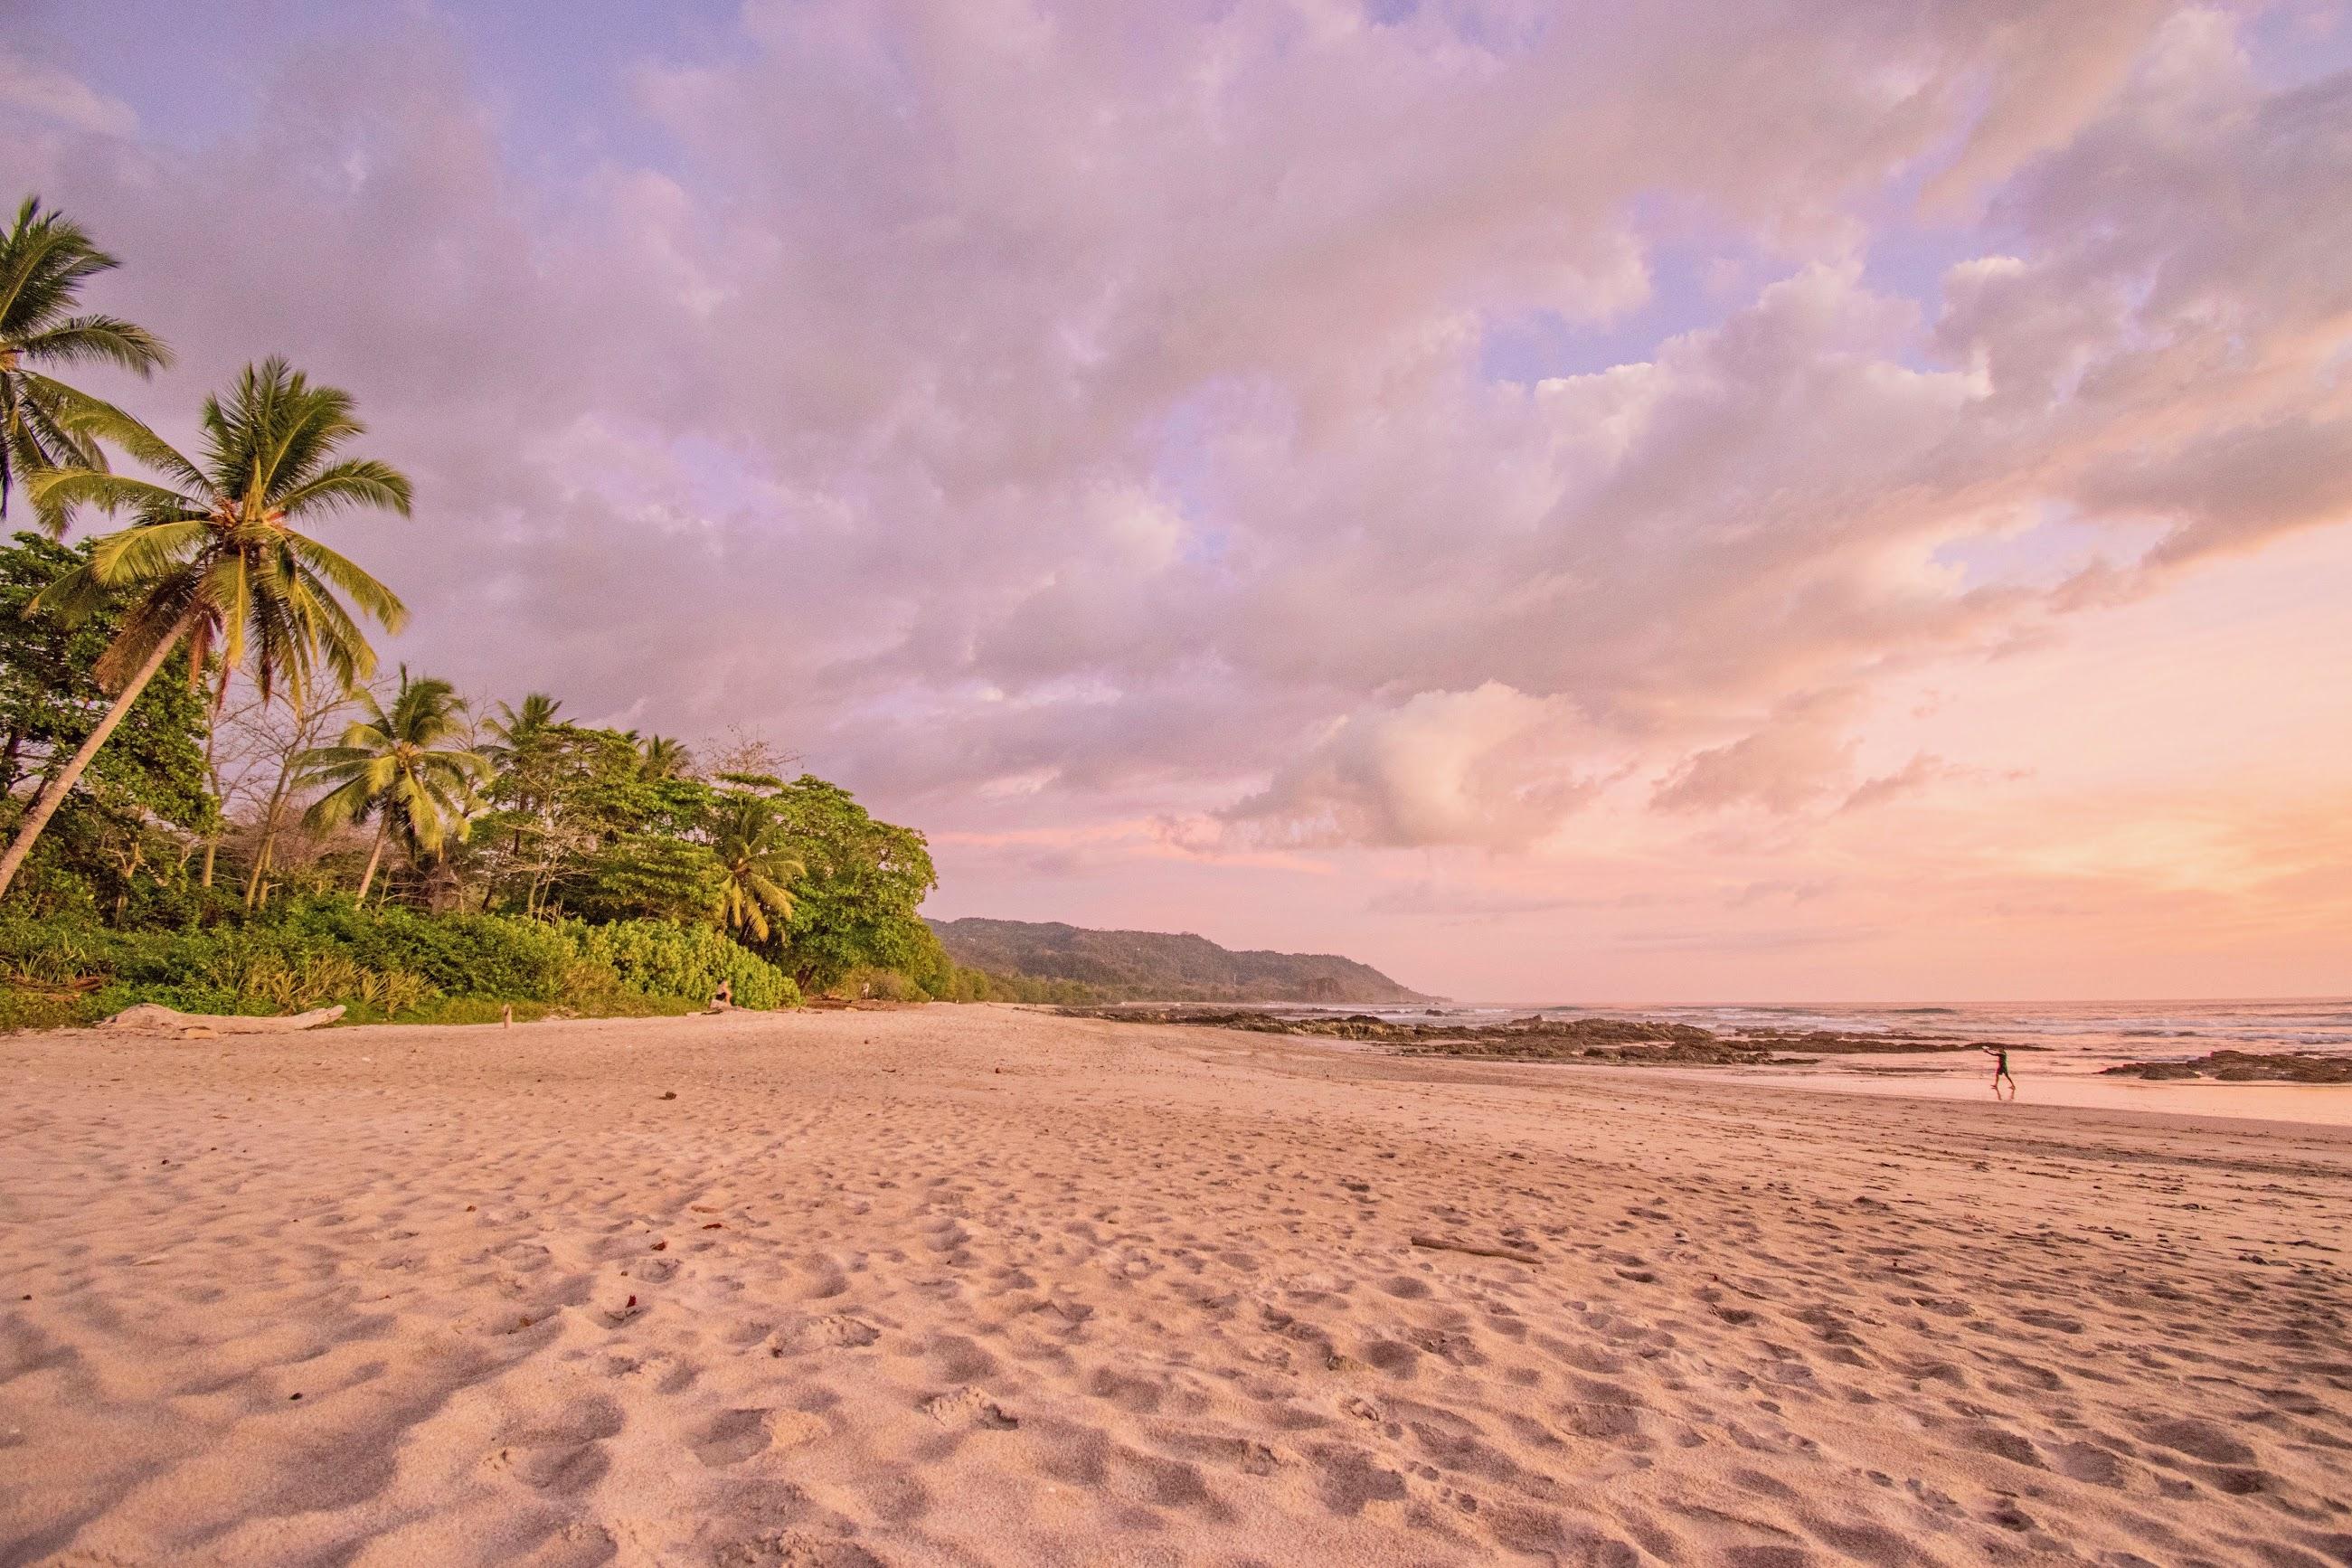 mooiste-plekken-costa-rica